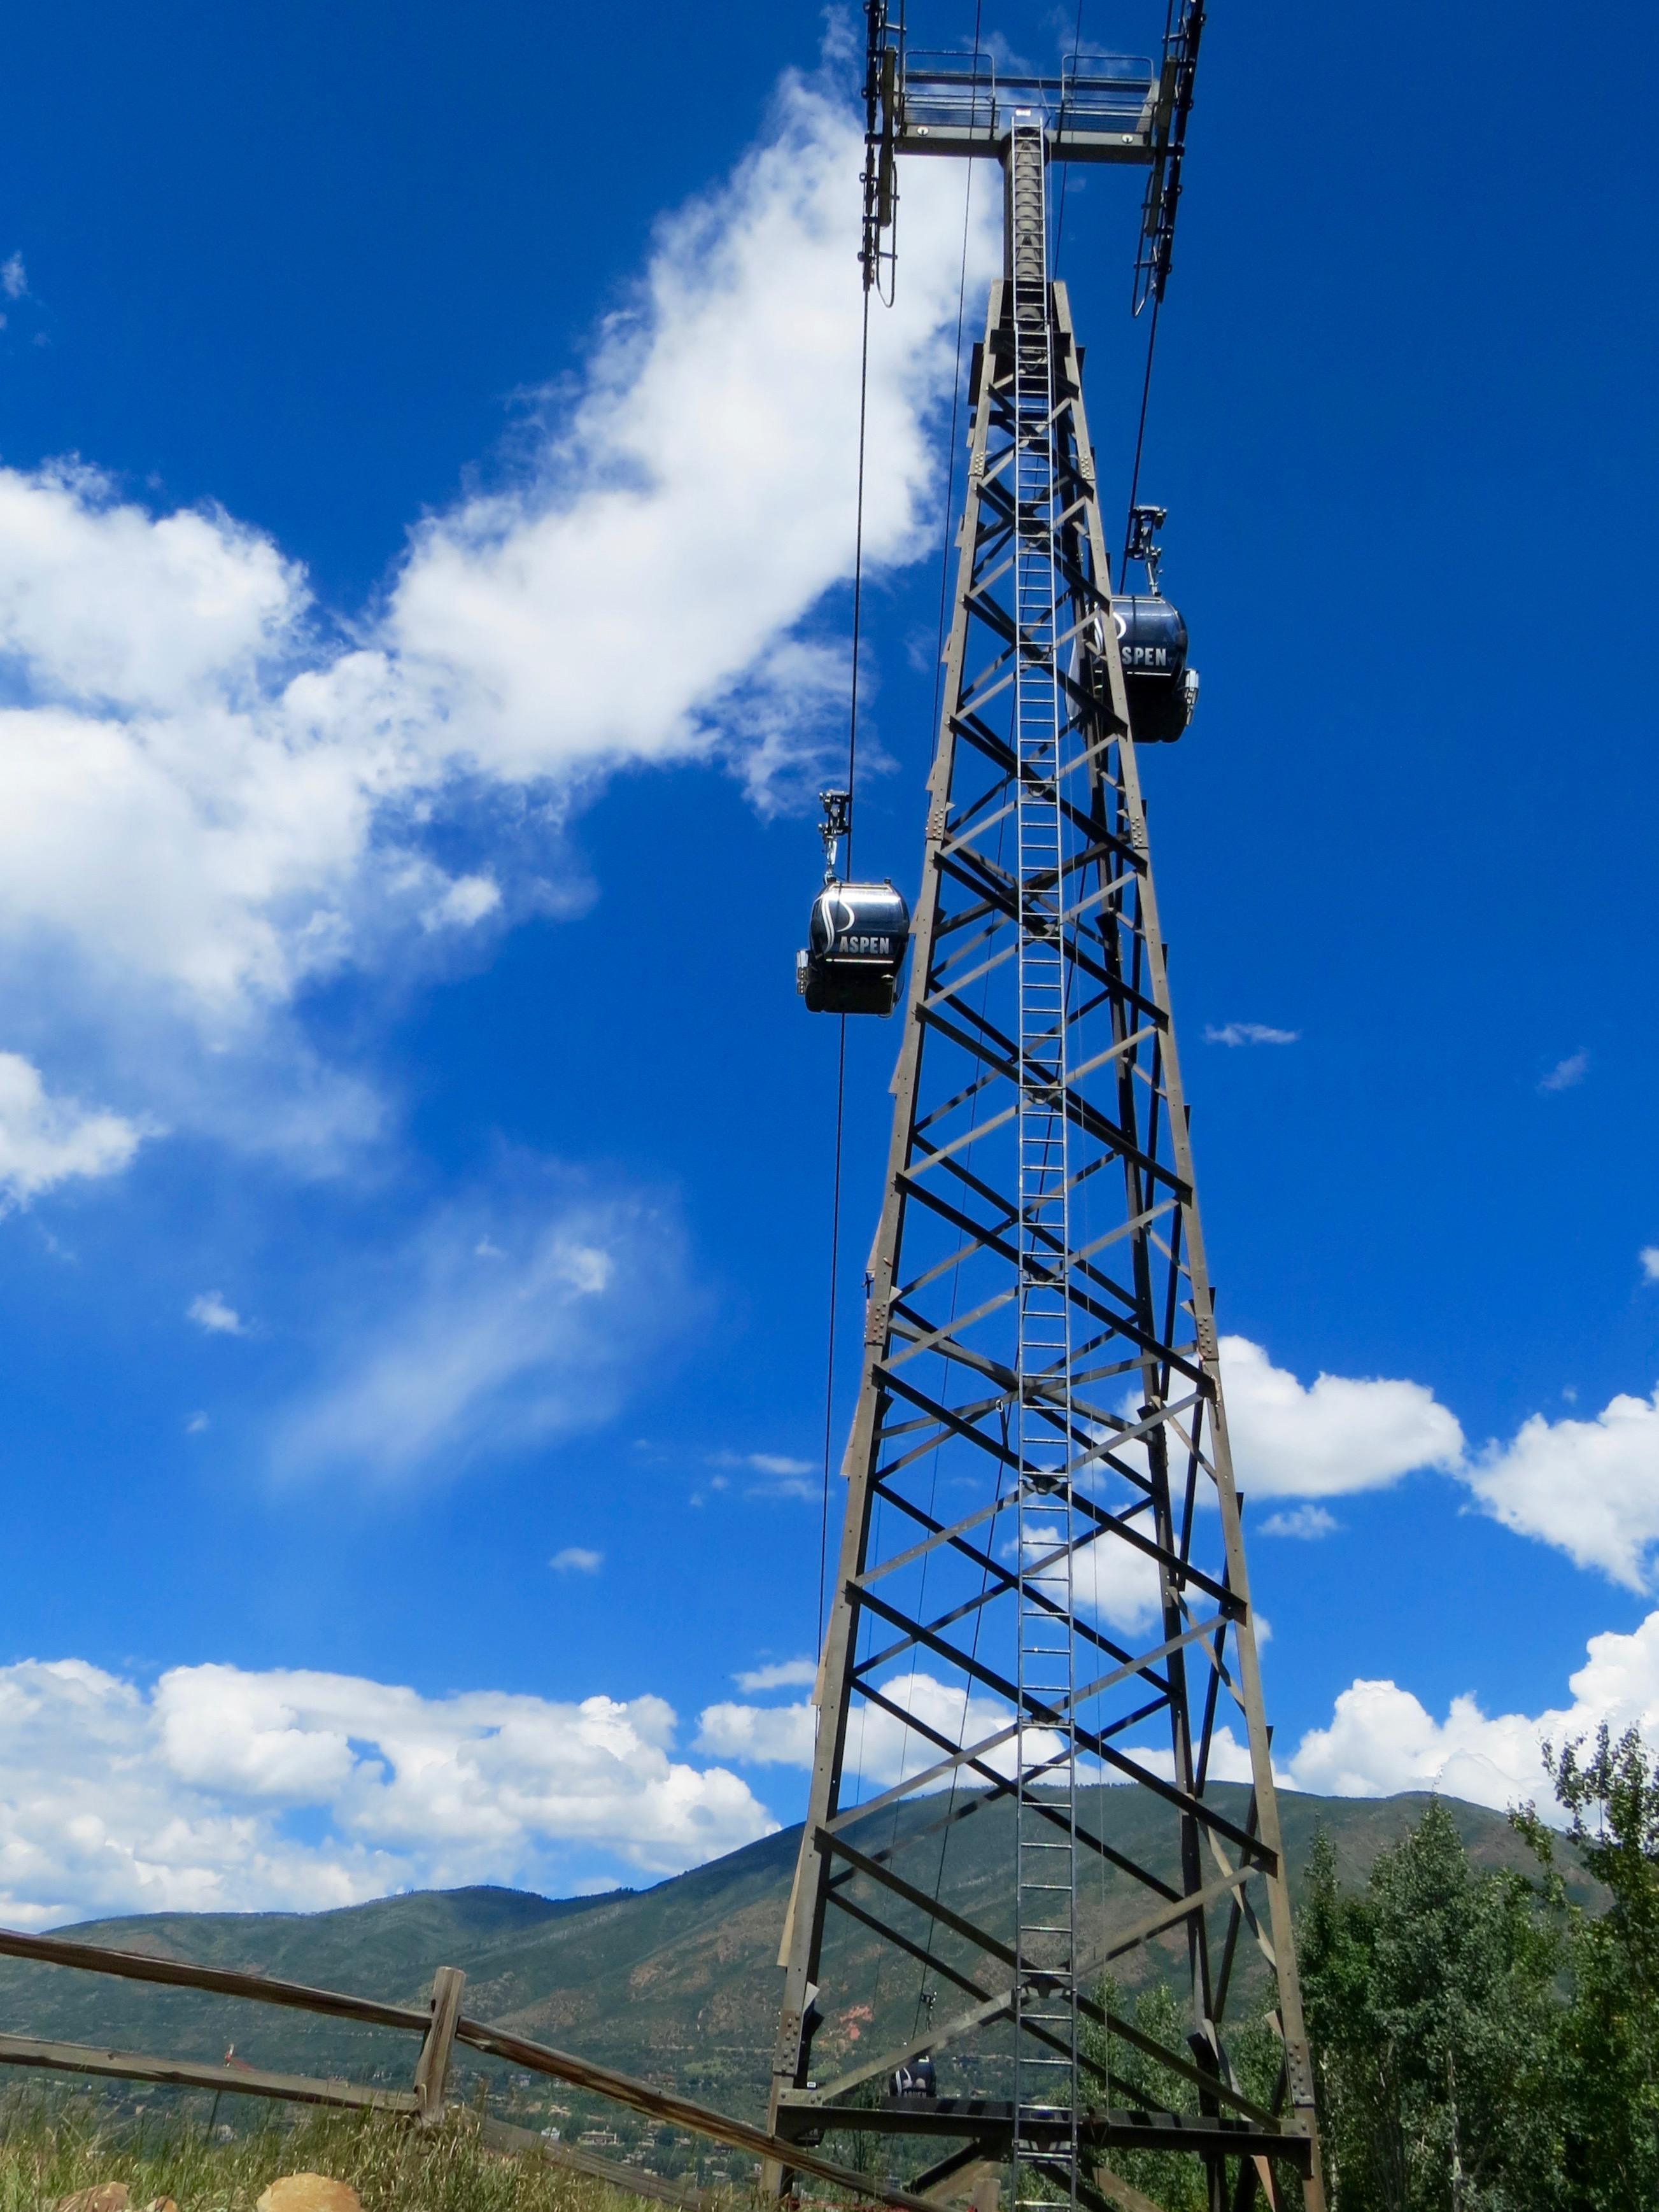 Nearby The Gant, the Aspen Mountain gondola runs all summer.